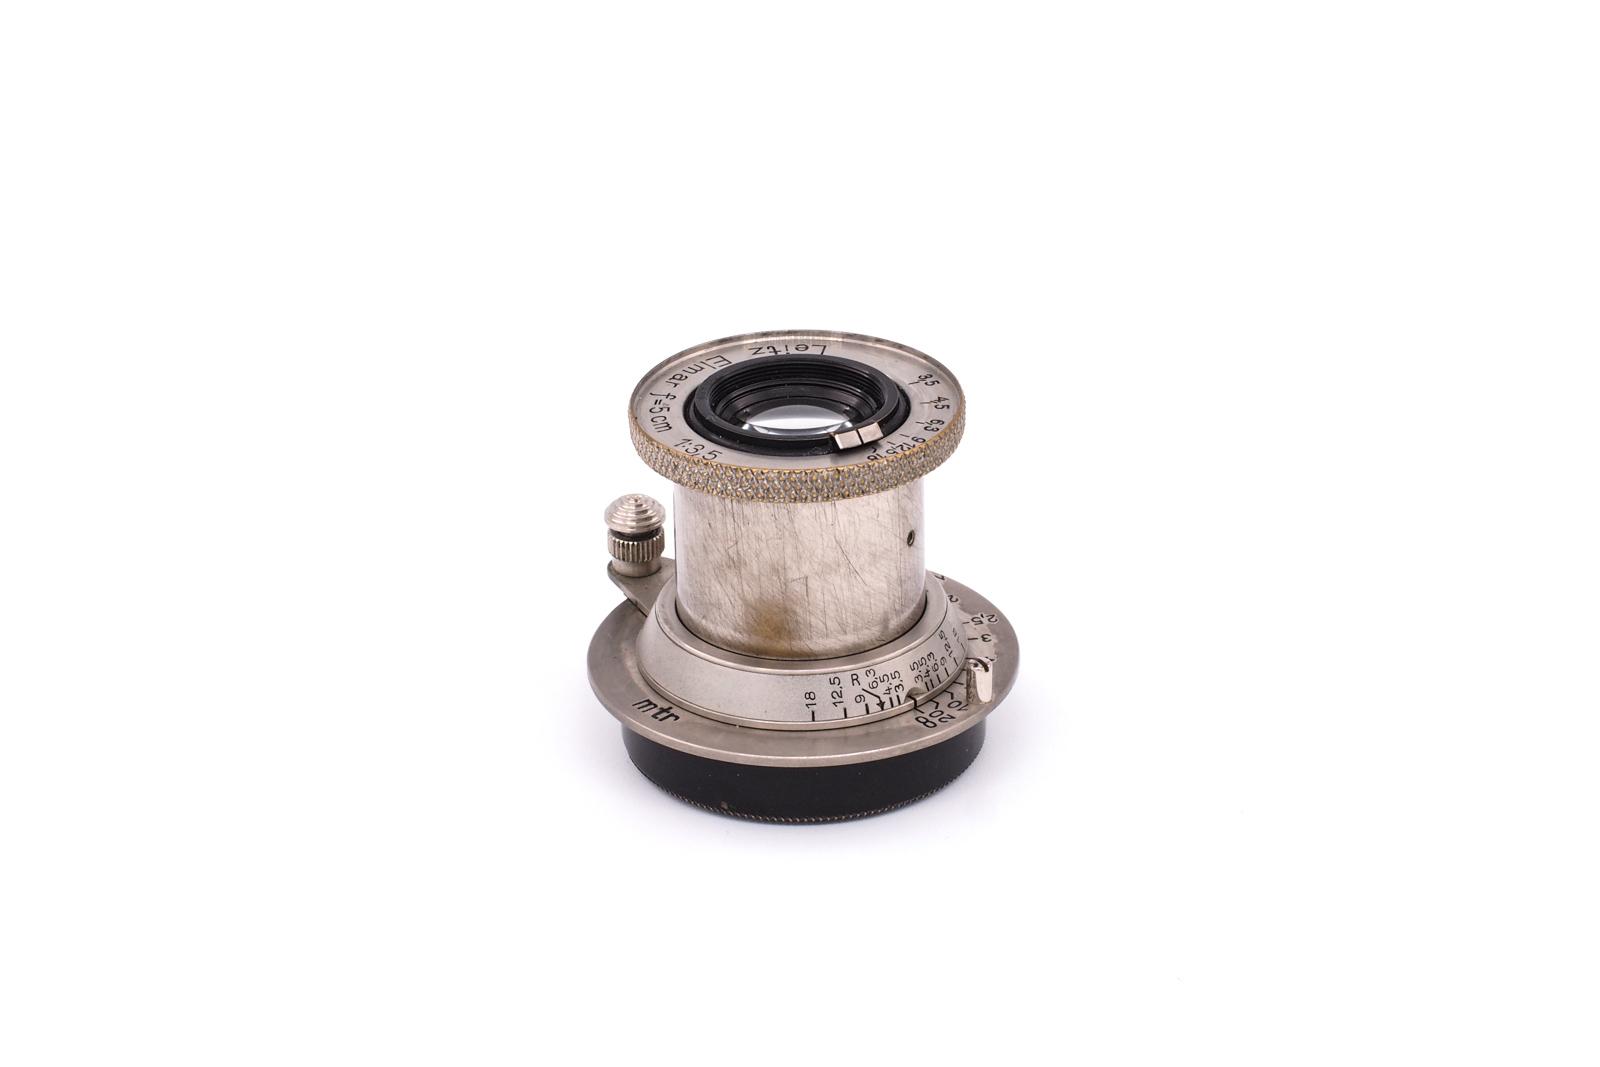 Leitz Elmar 1:3.5/5cm nickel